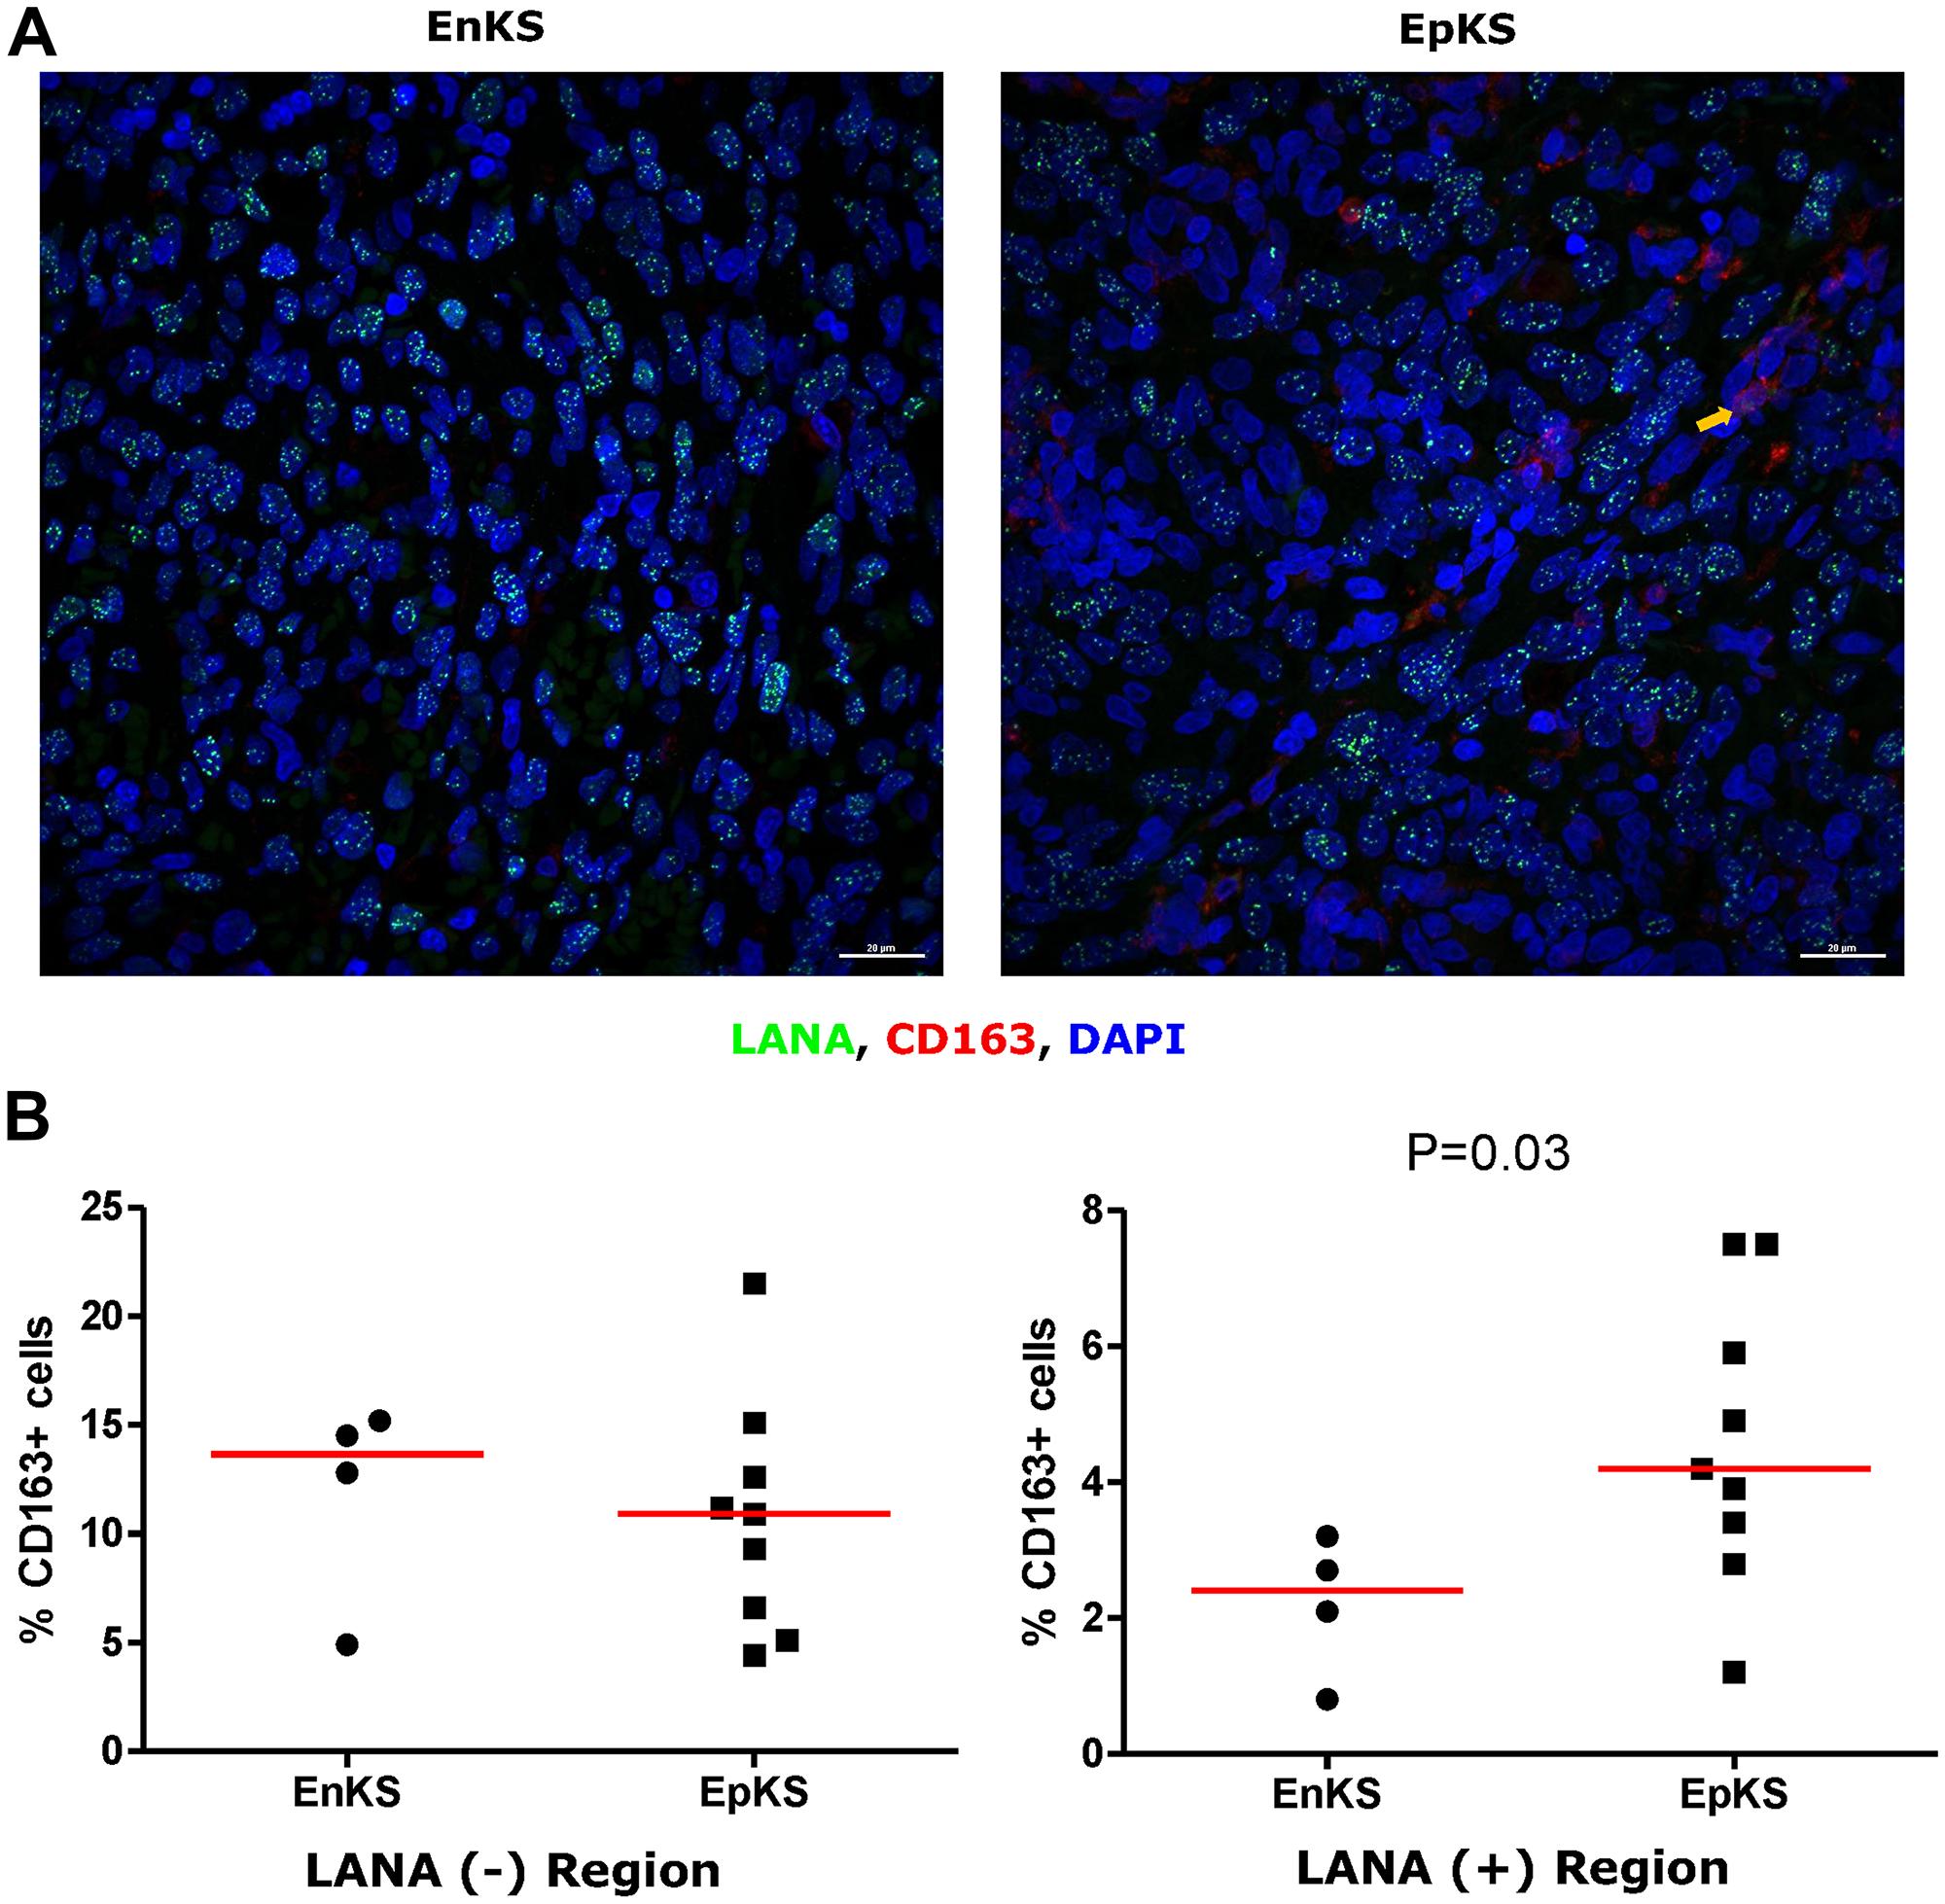 Dual-immunofluorescence staining of Kaposi's Sarcoma-associated Herpesvirus (KSHV) Latency Associated Nuclear Antigen (LANA) protein and CD163 on Kaposi's Sarcoma (KS) tissues.